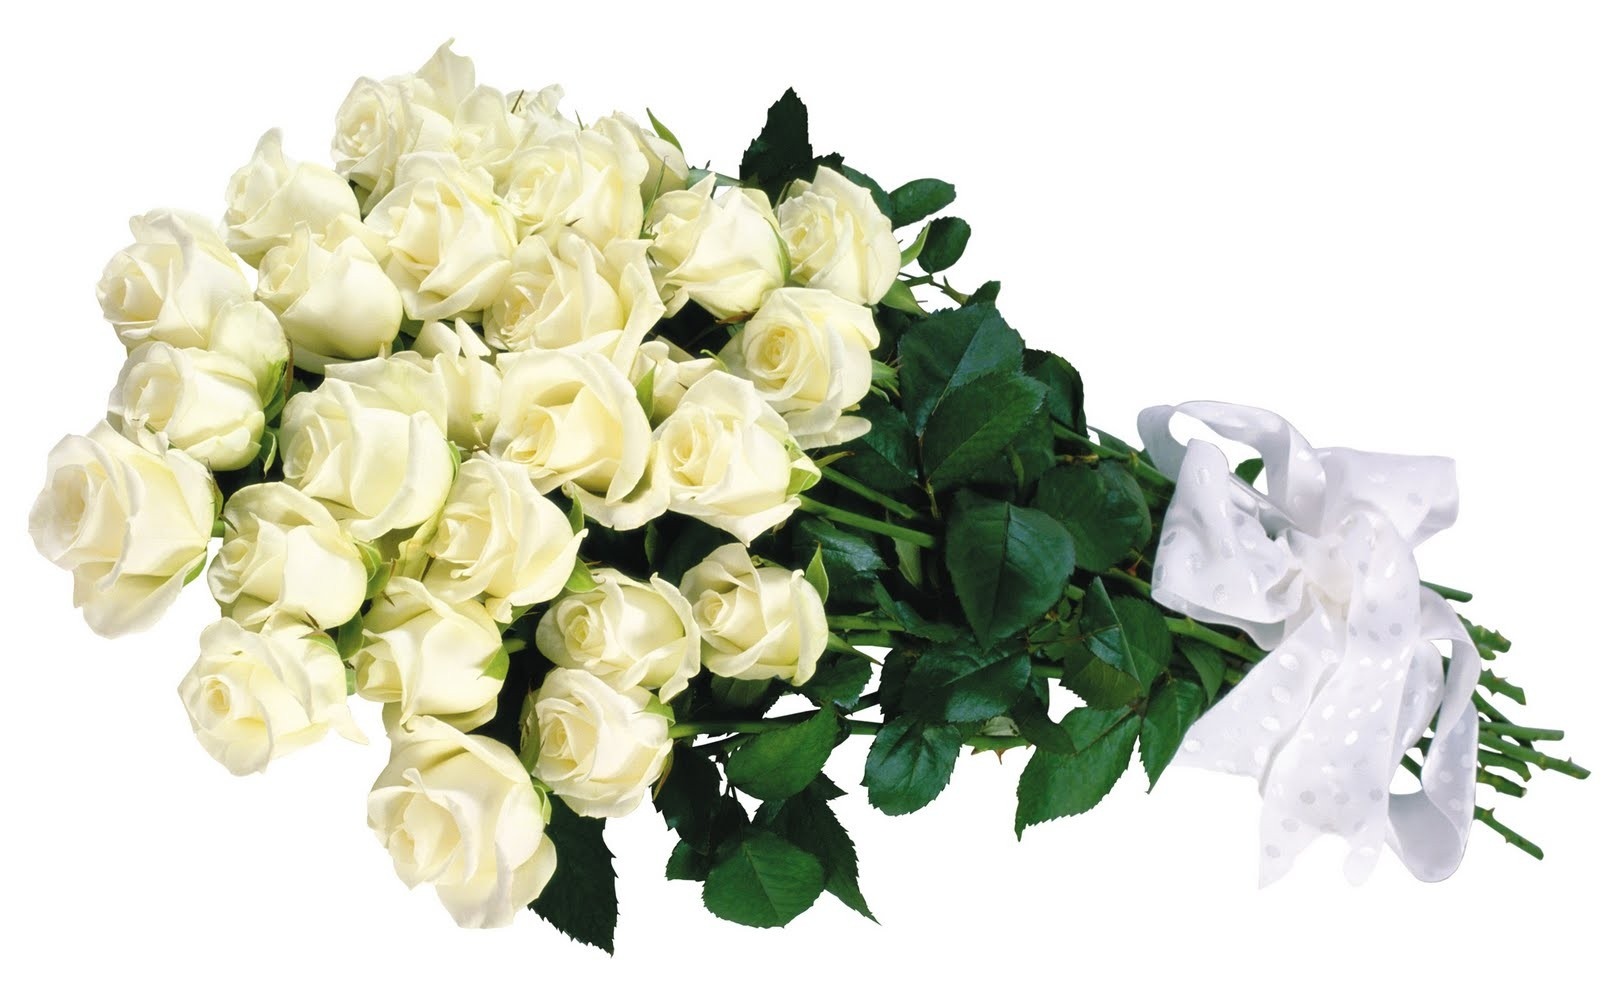 Friend Bouquet Roses Helen Flowers White Caramelie Gift Sweet Download Flower Desktop